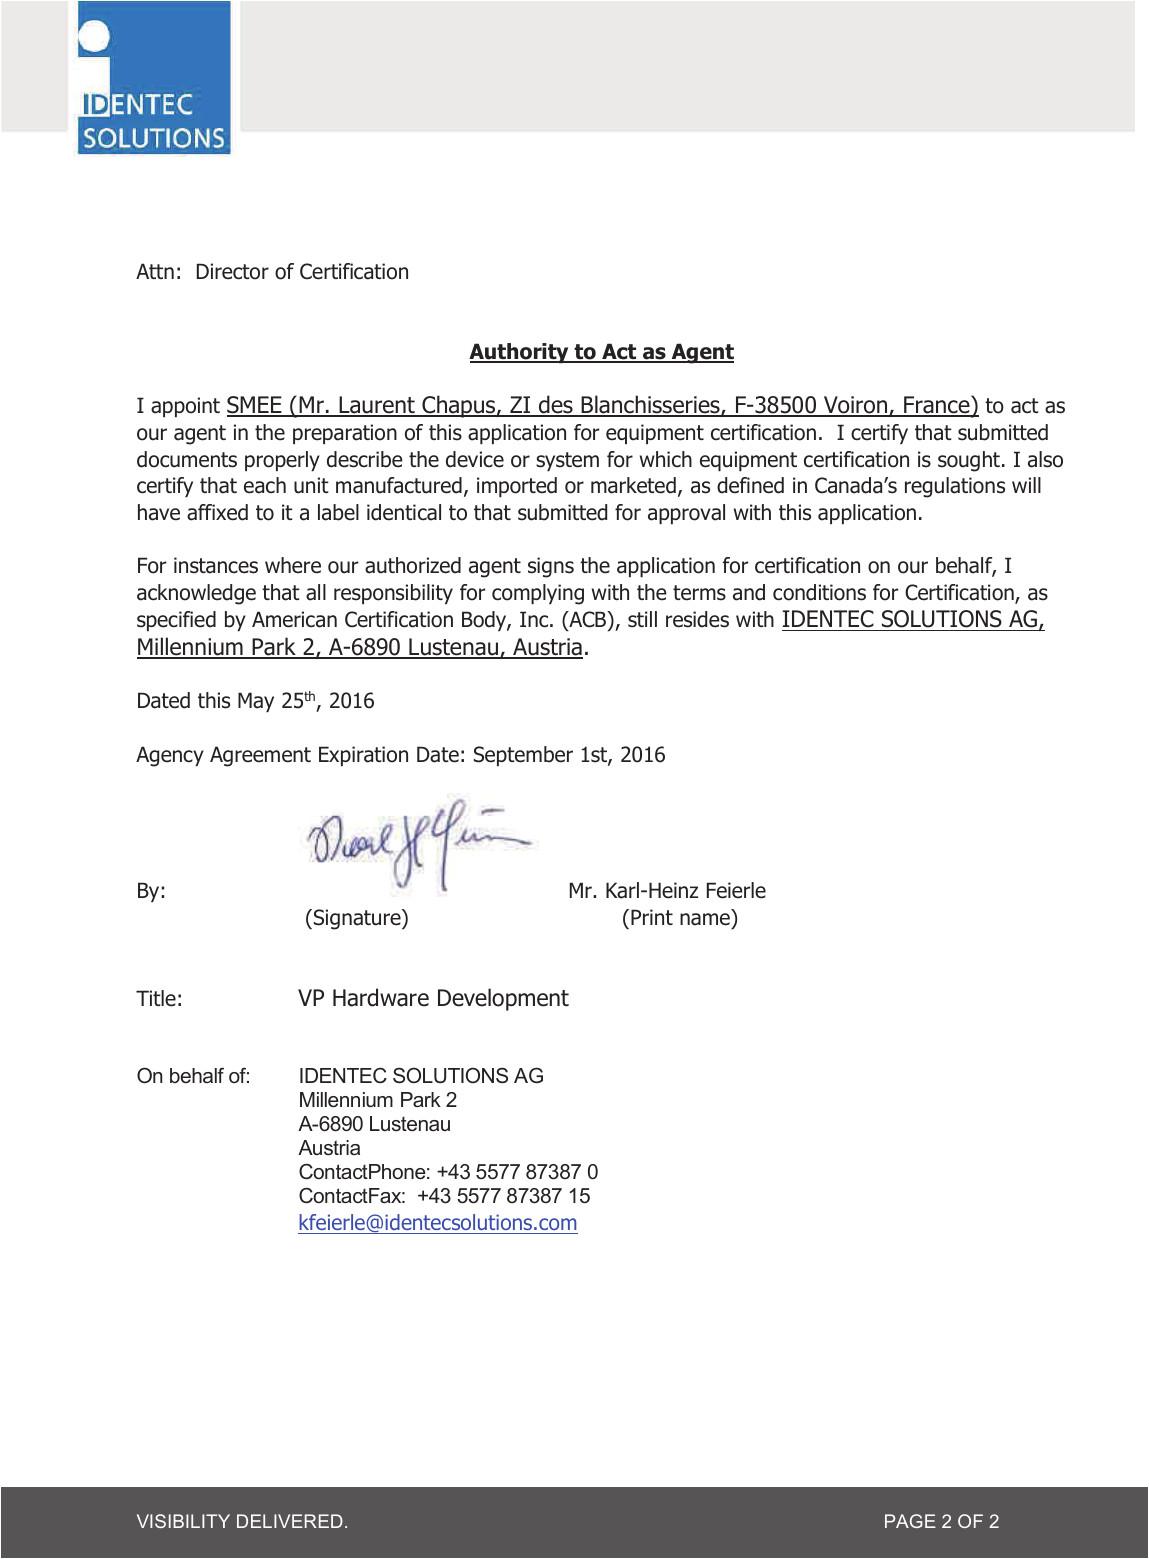 document id 3051177